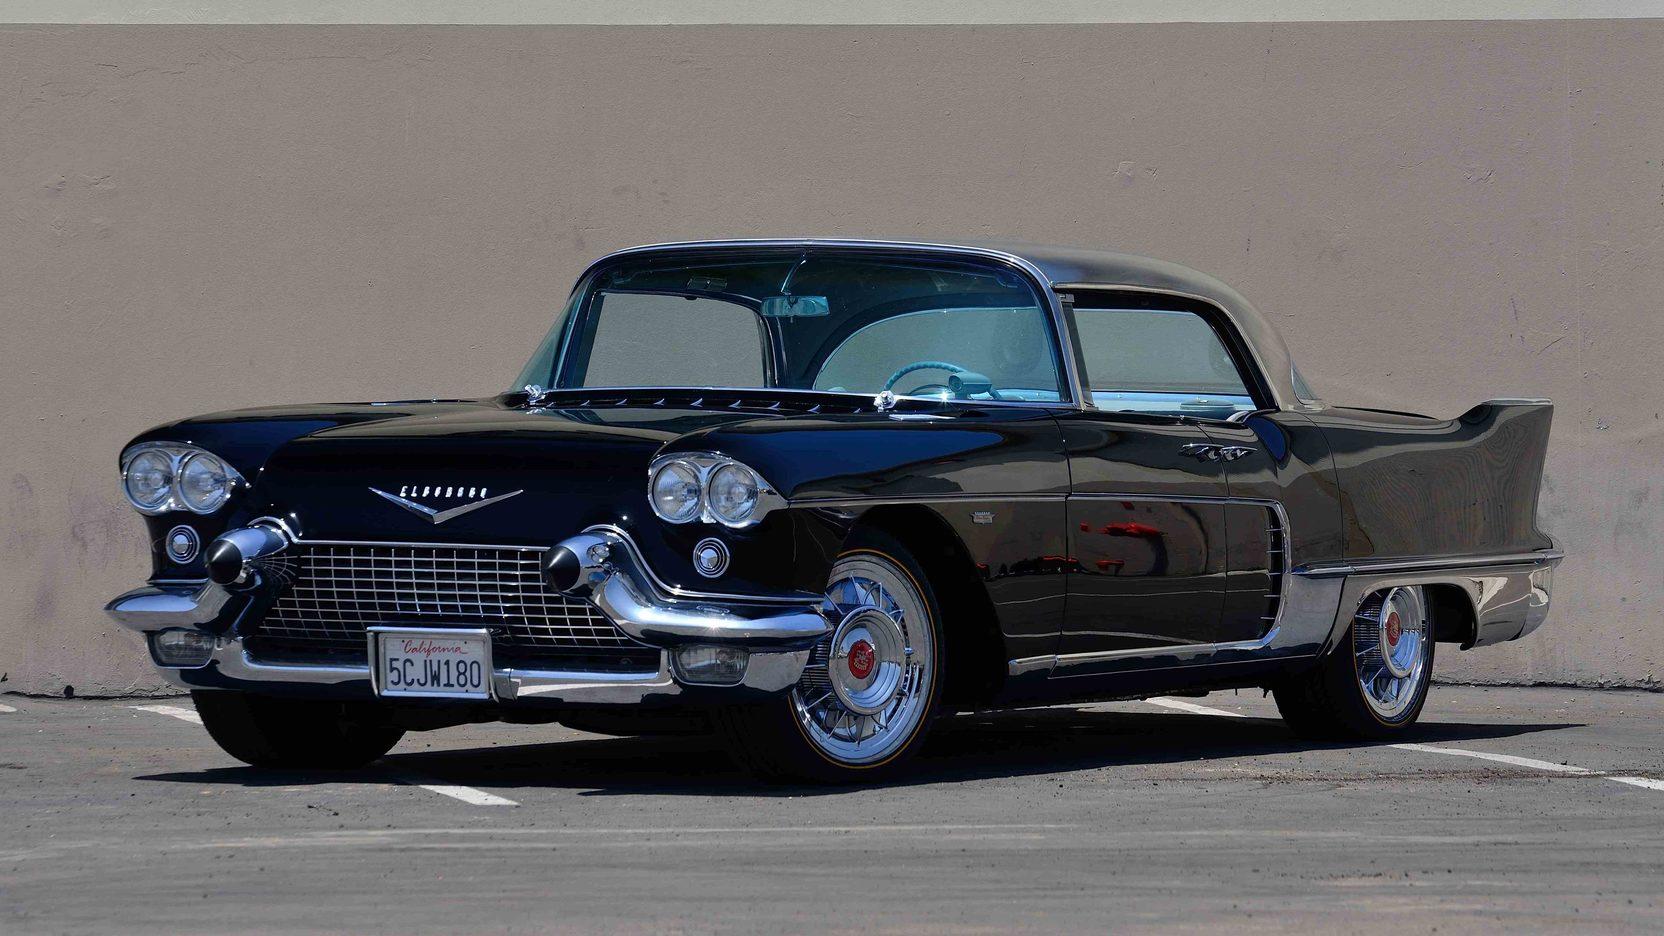 HQ 1958 Cadillac Eldorado Brougham Wallpapers | File 227.73Kb